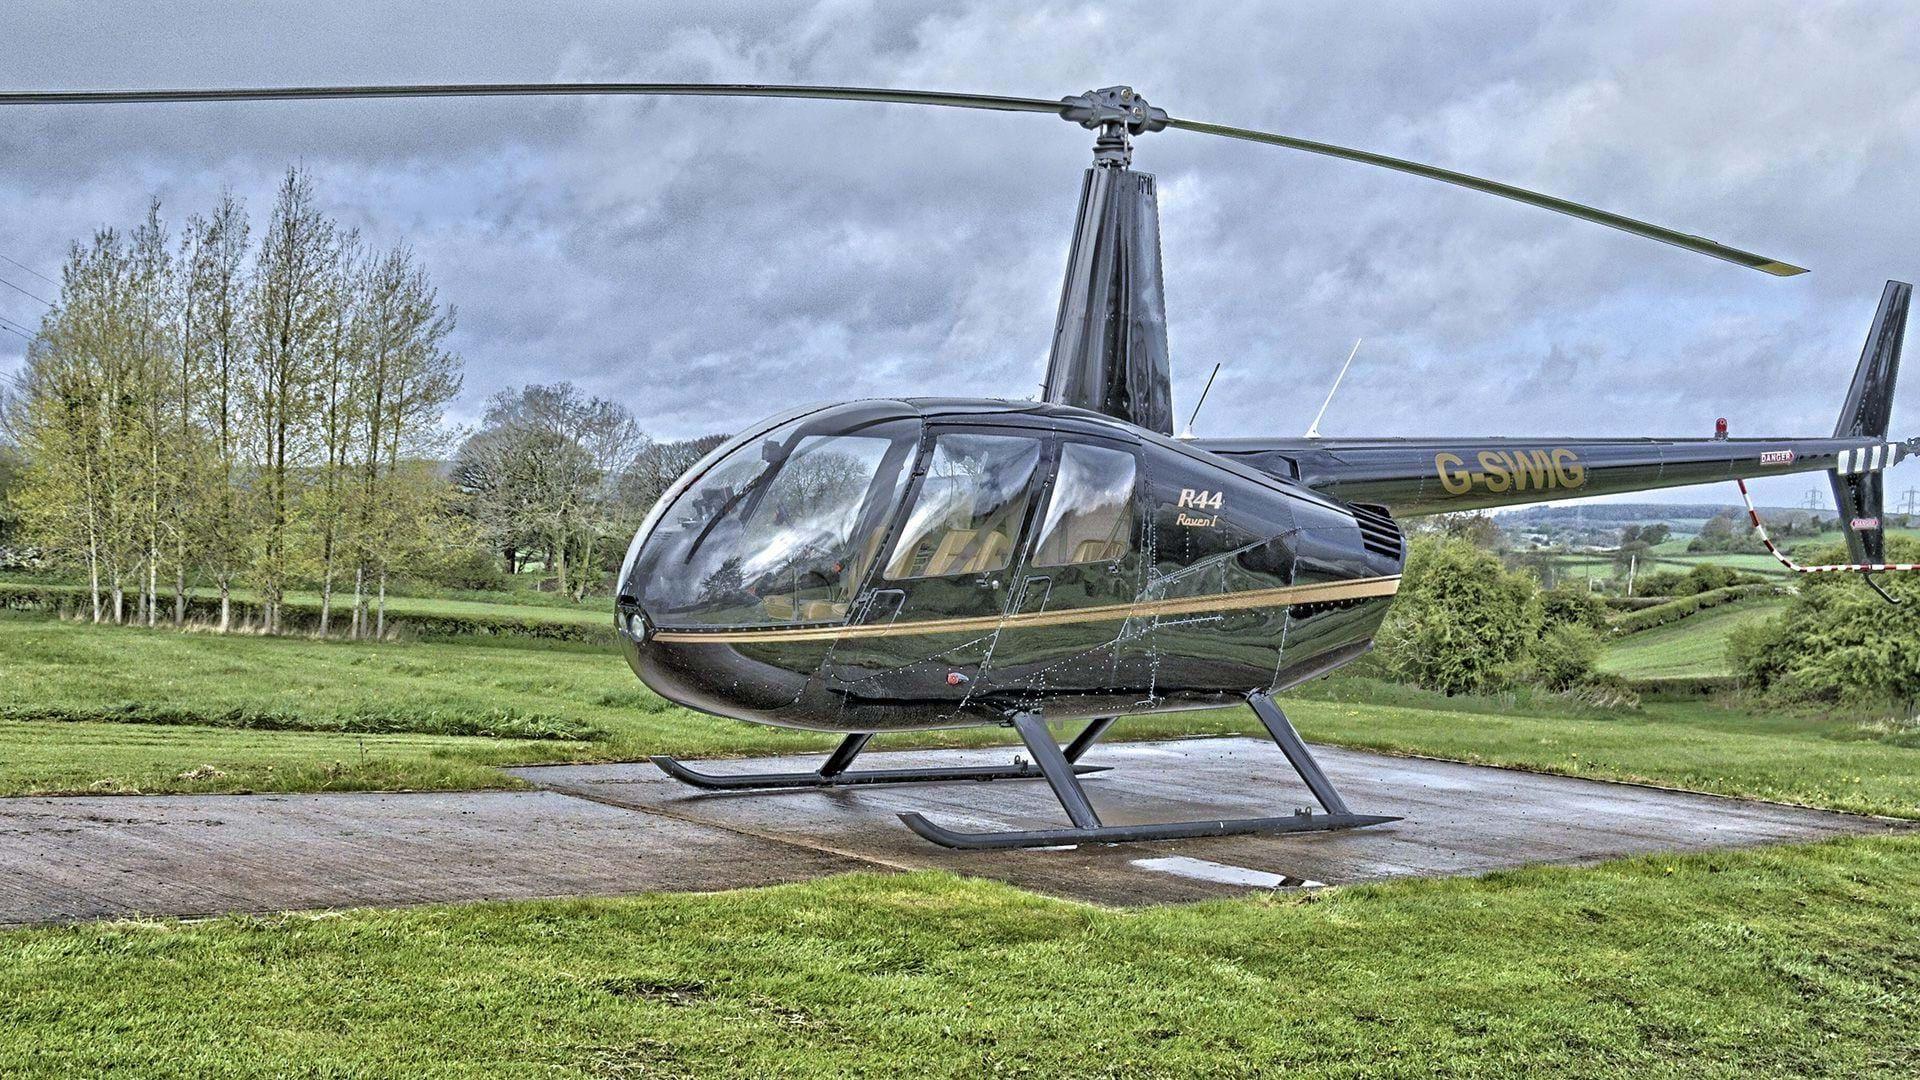 HTR - Helicopter Total Realism • HeliSimmer com